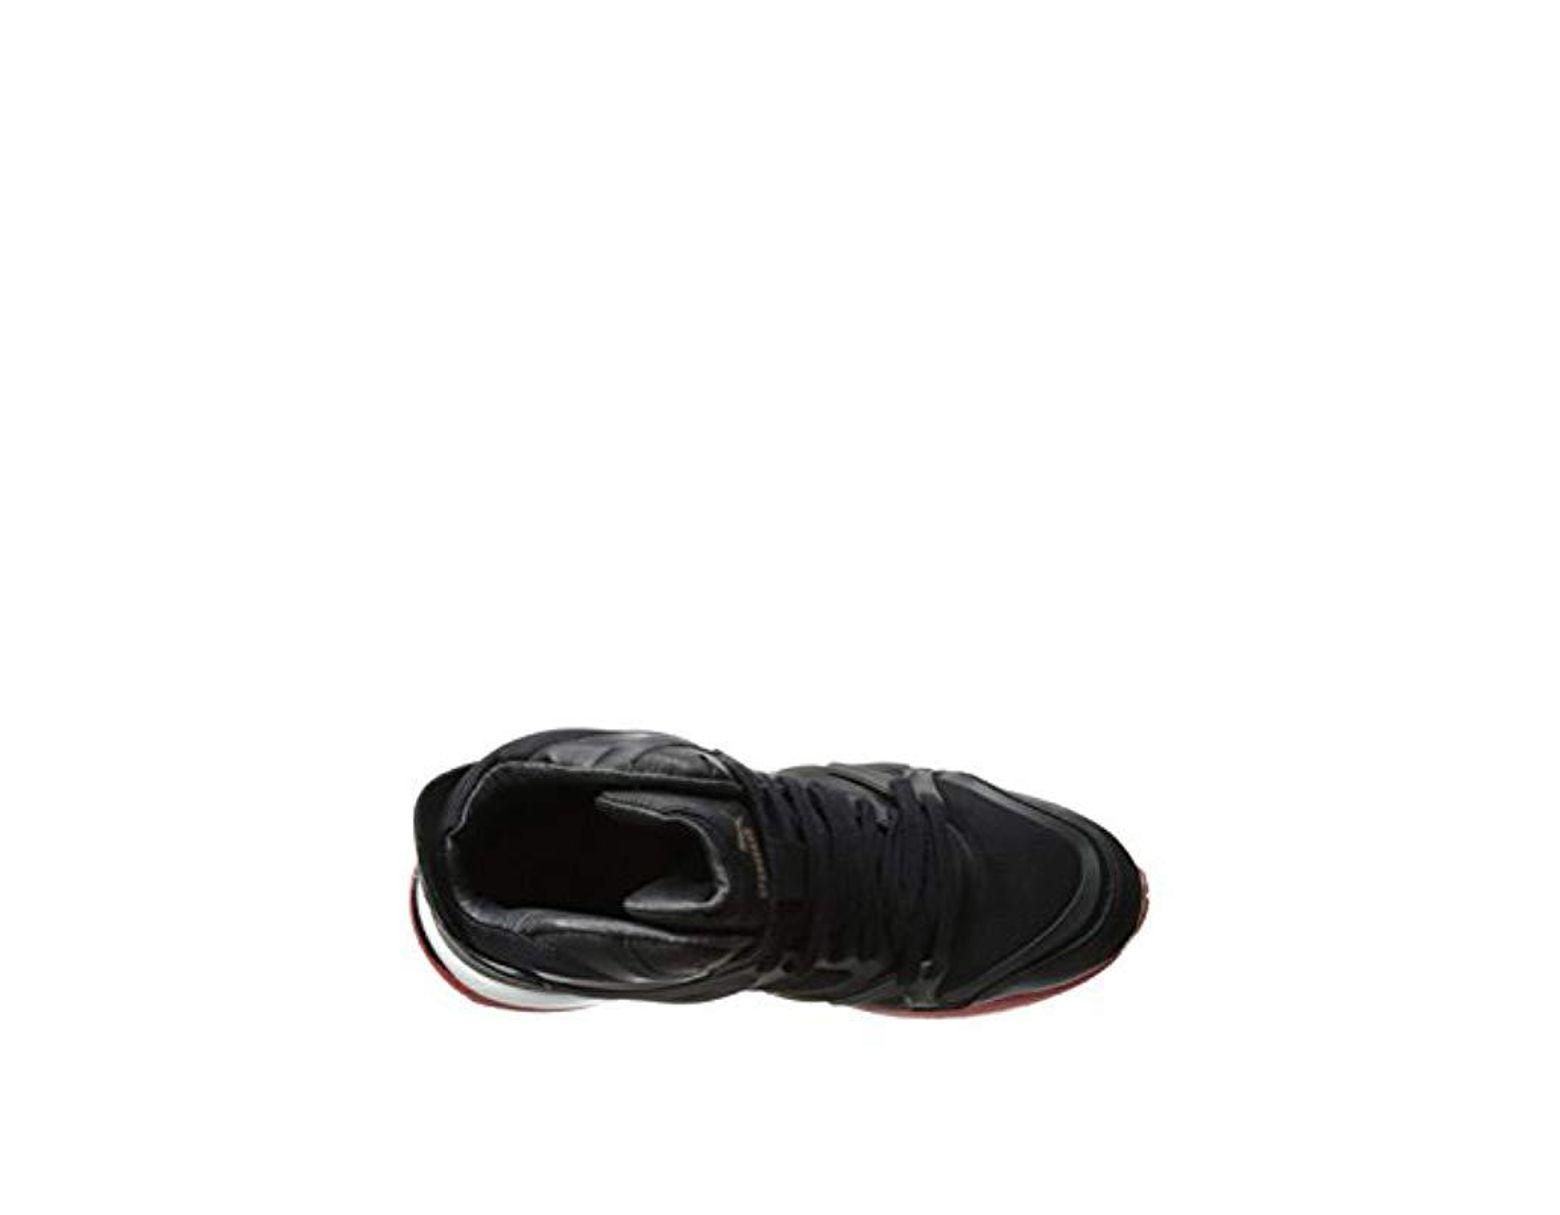 Puma Mens McQ Run Mid Alexander McQueen BlackRed Synthetic